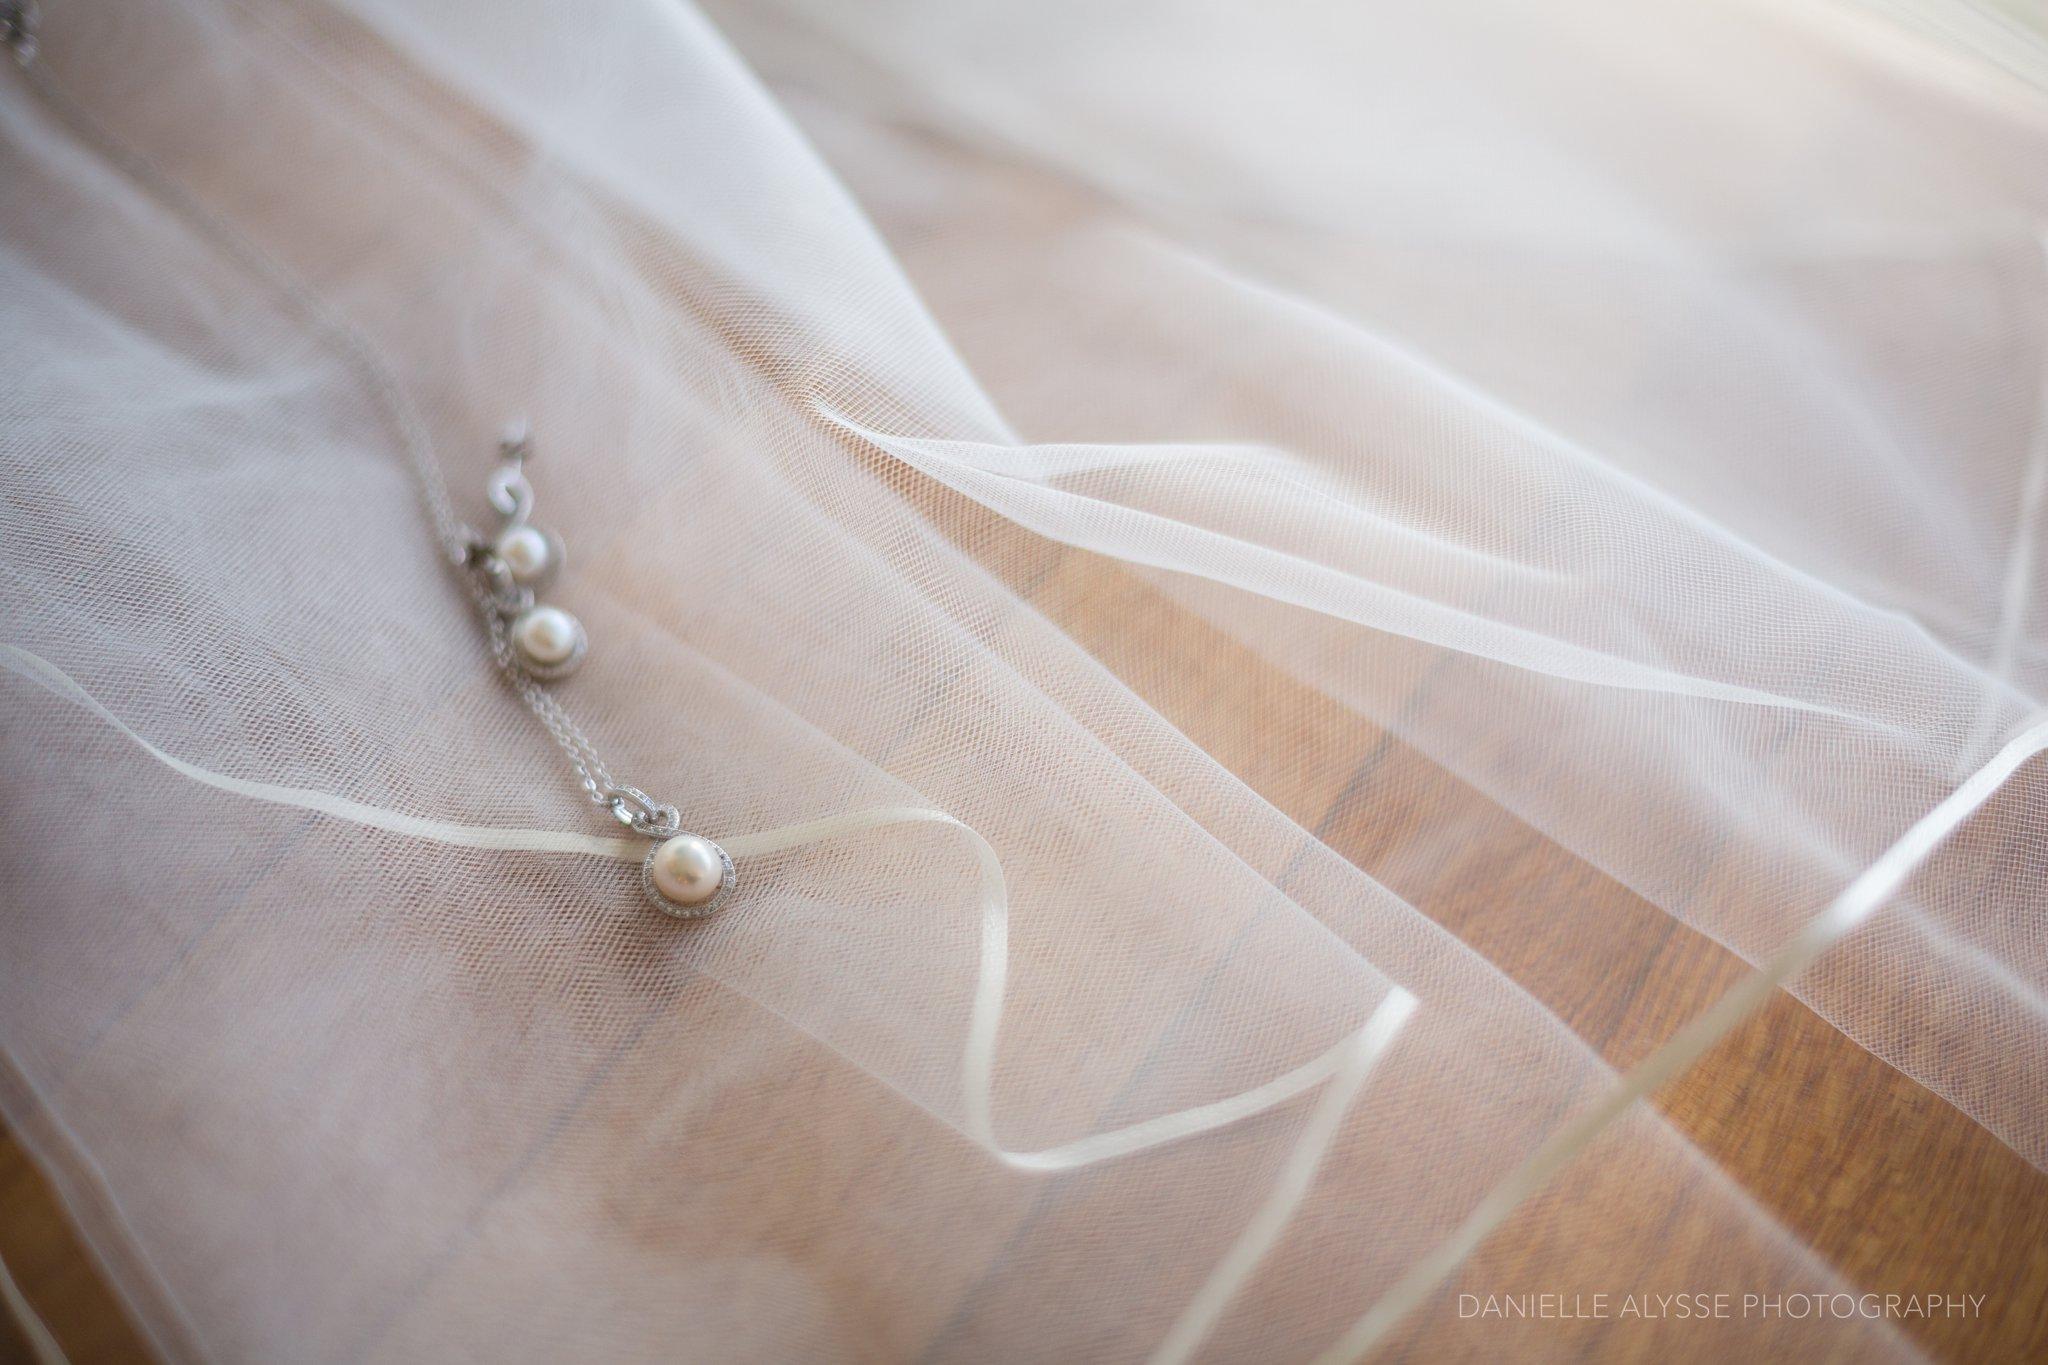 170429_blog_kimberly_ben_wedding_san_mateo_curiodyssey_danielle_alysse_photography_sacramento_photographer0001_WEB.jpg